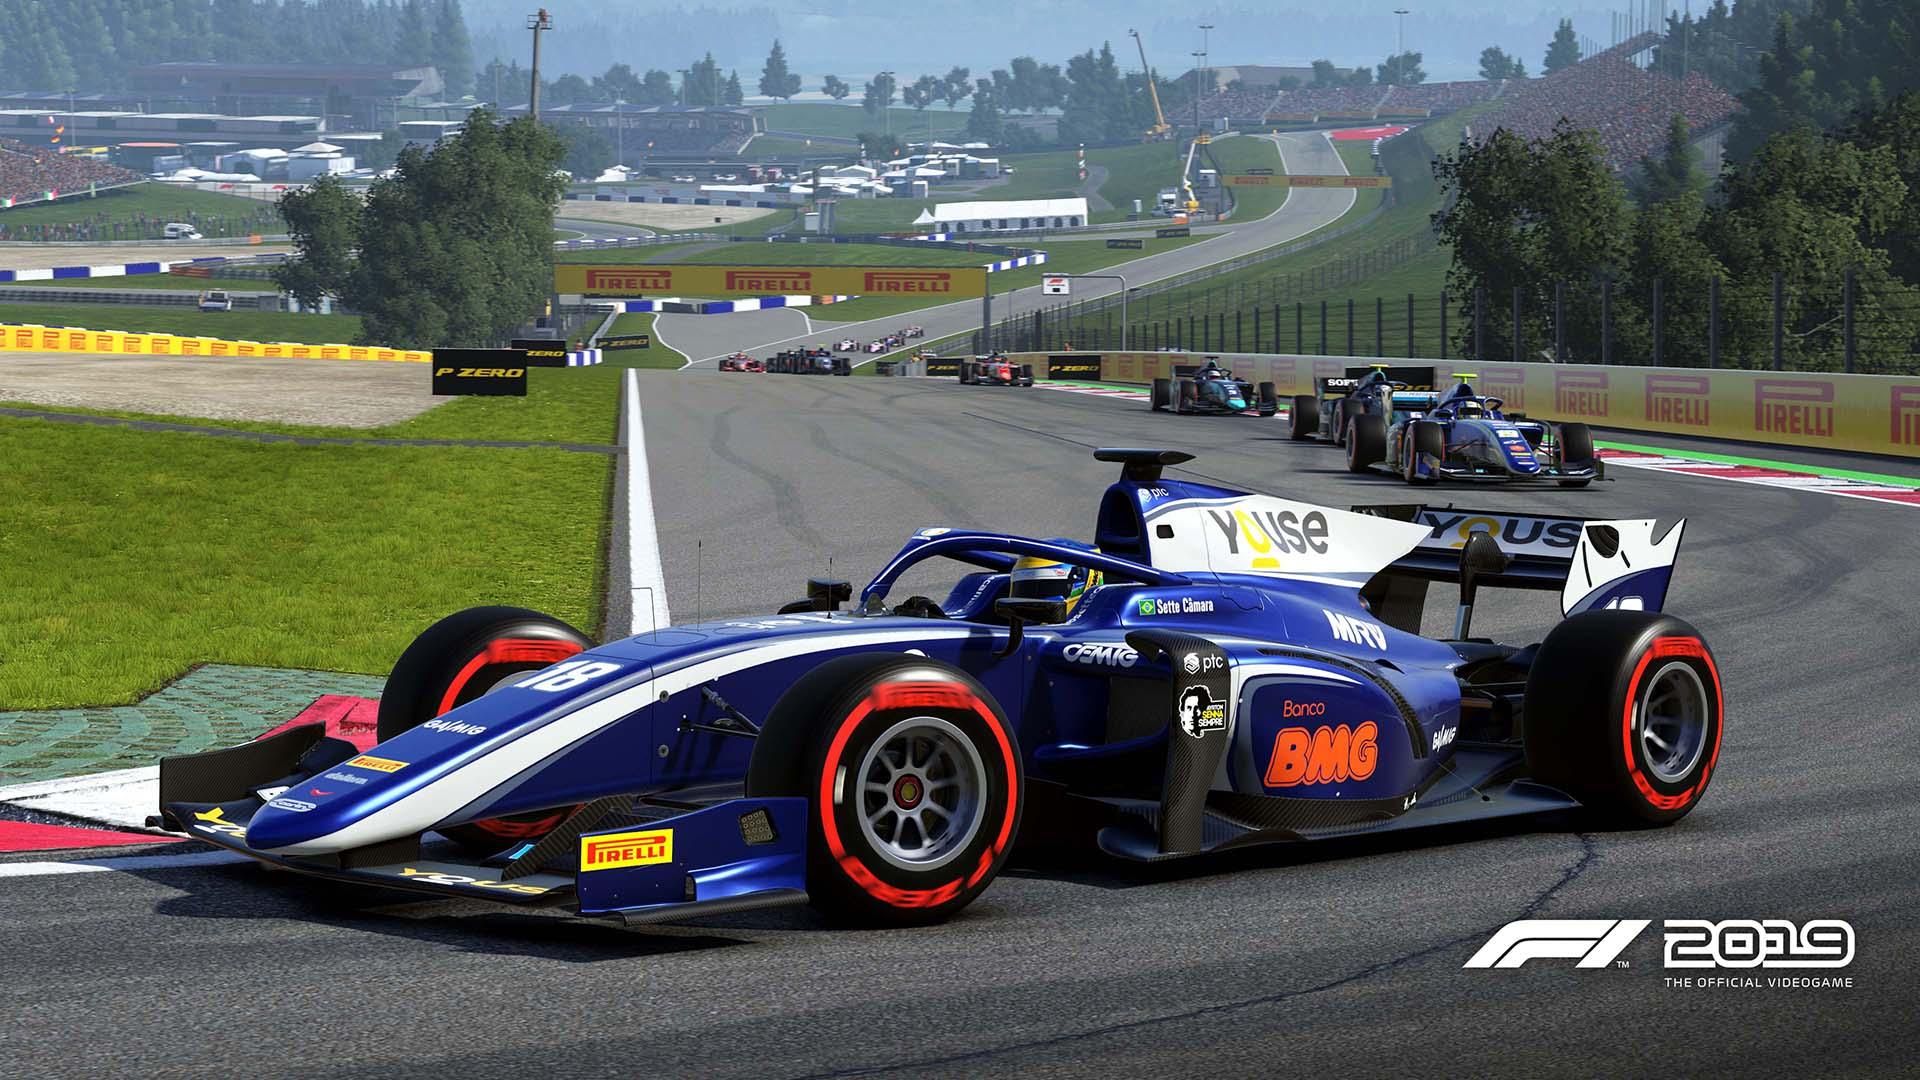 F1 2019 (10)